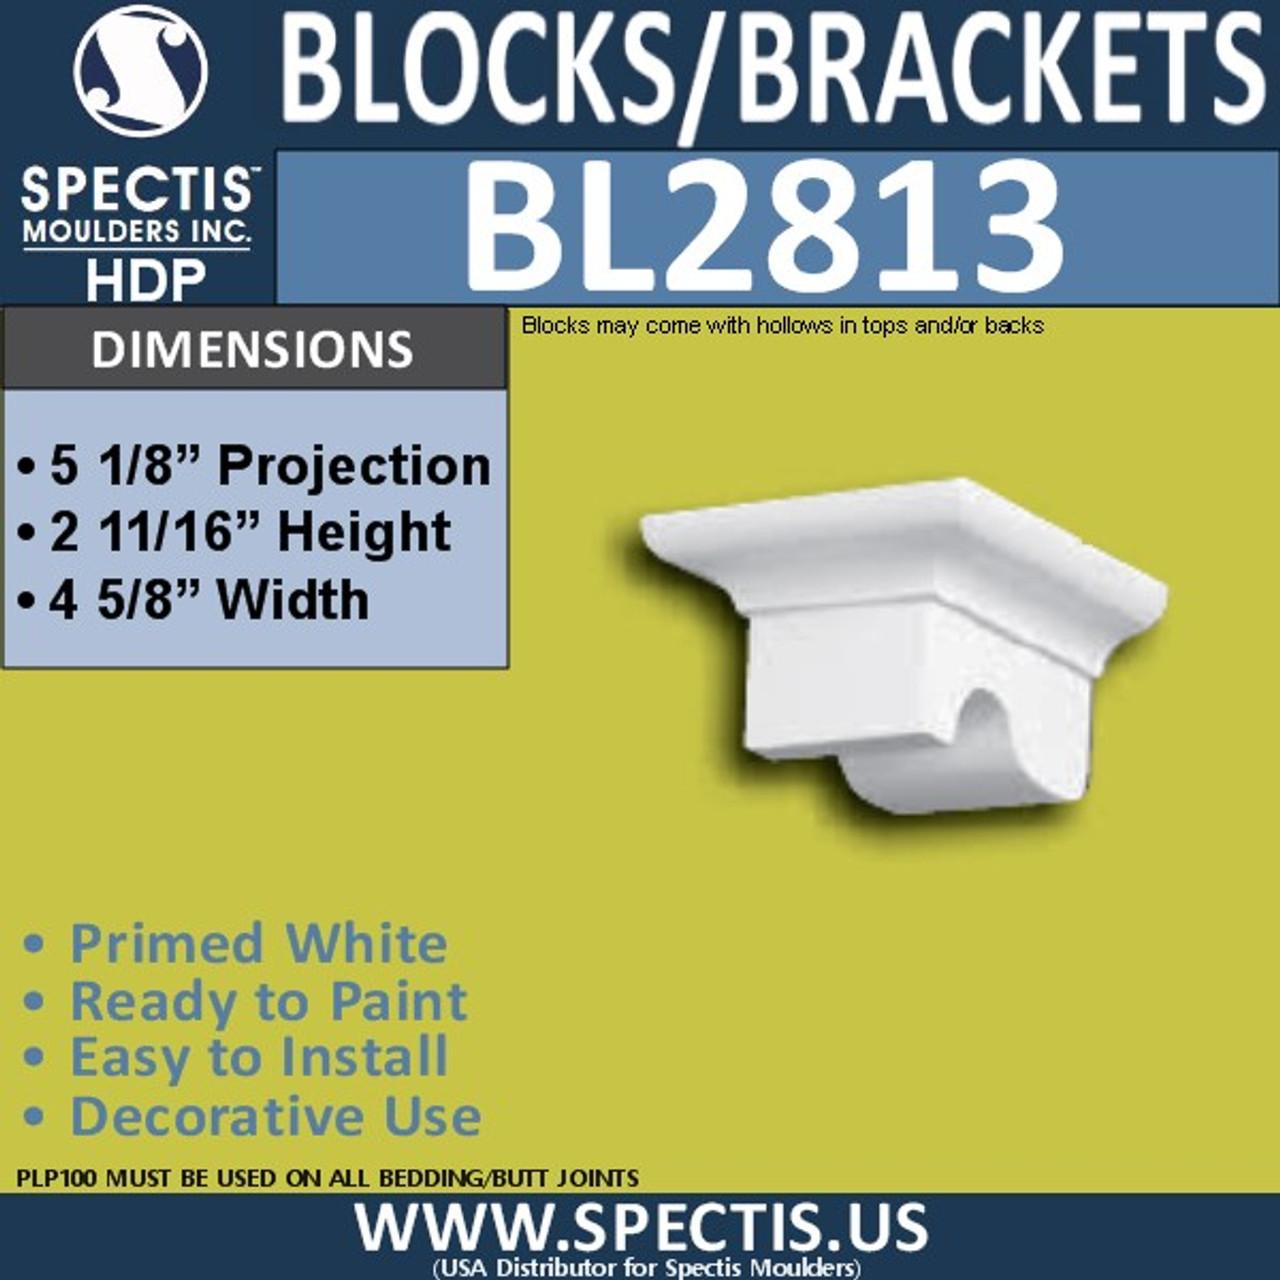 "BL2813 Eave Block or Bracket 4.5""W x 2.8""H x 5.1"" P"